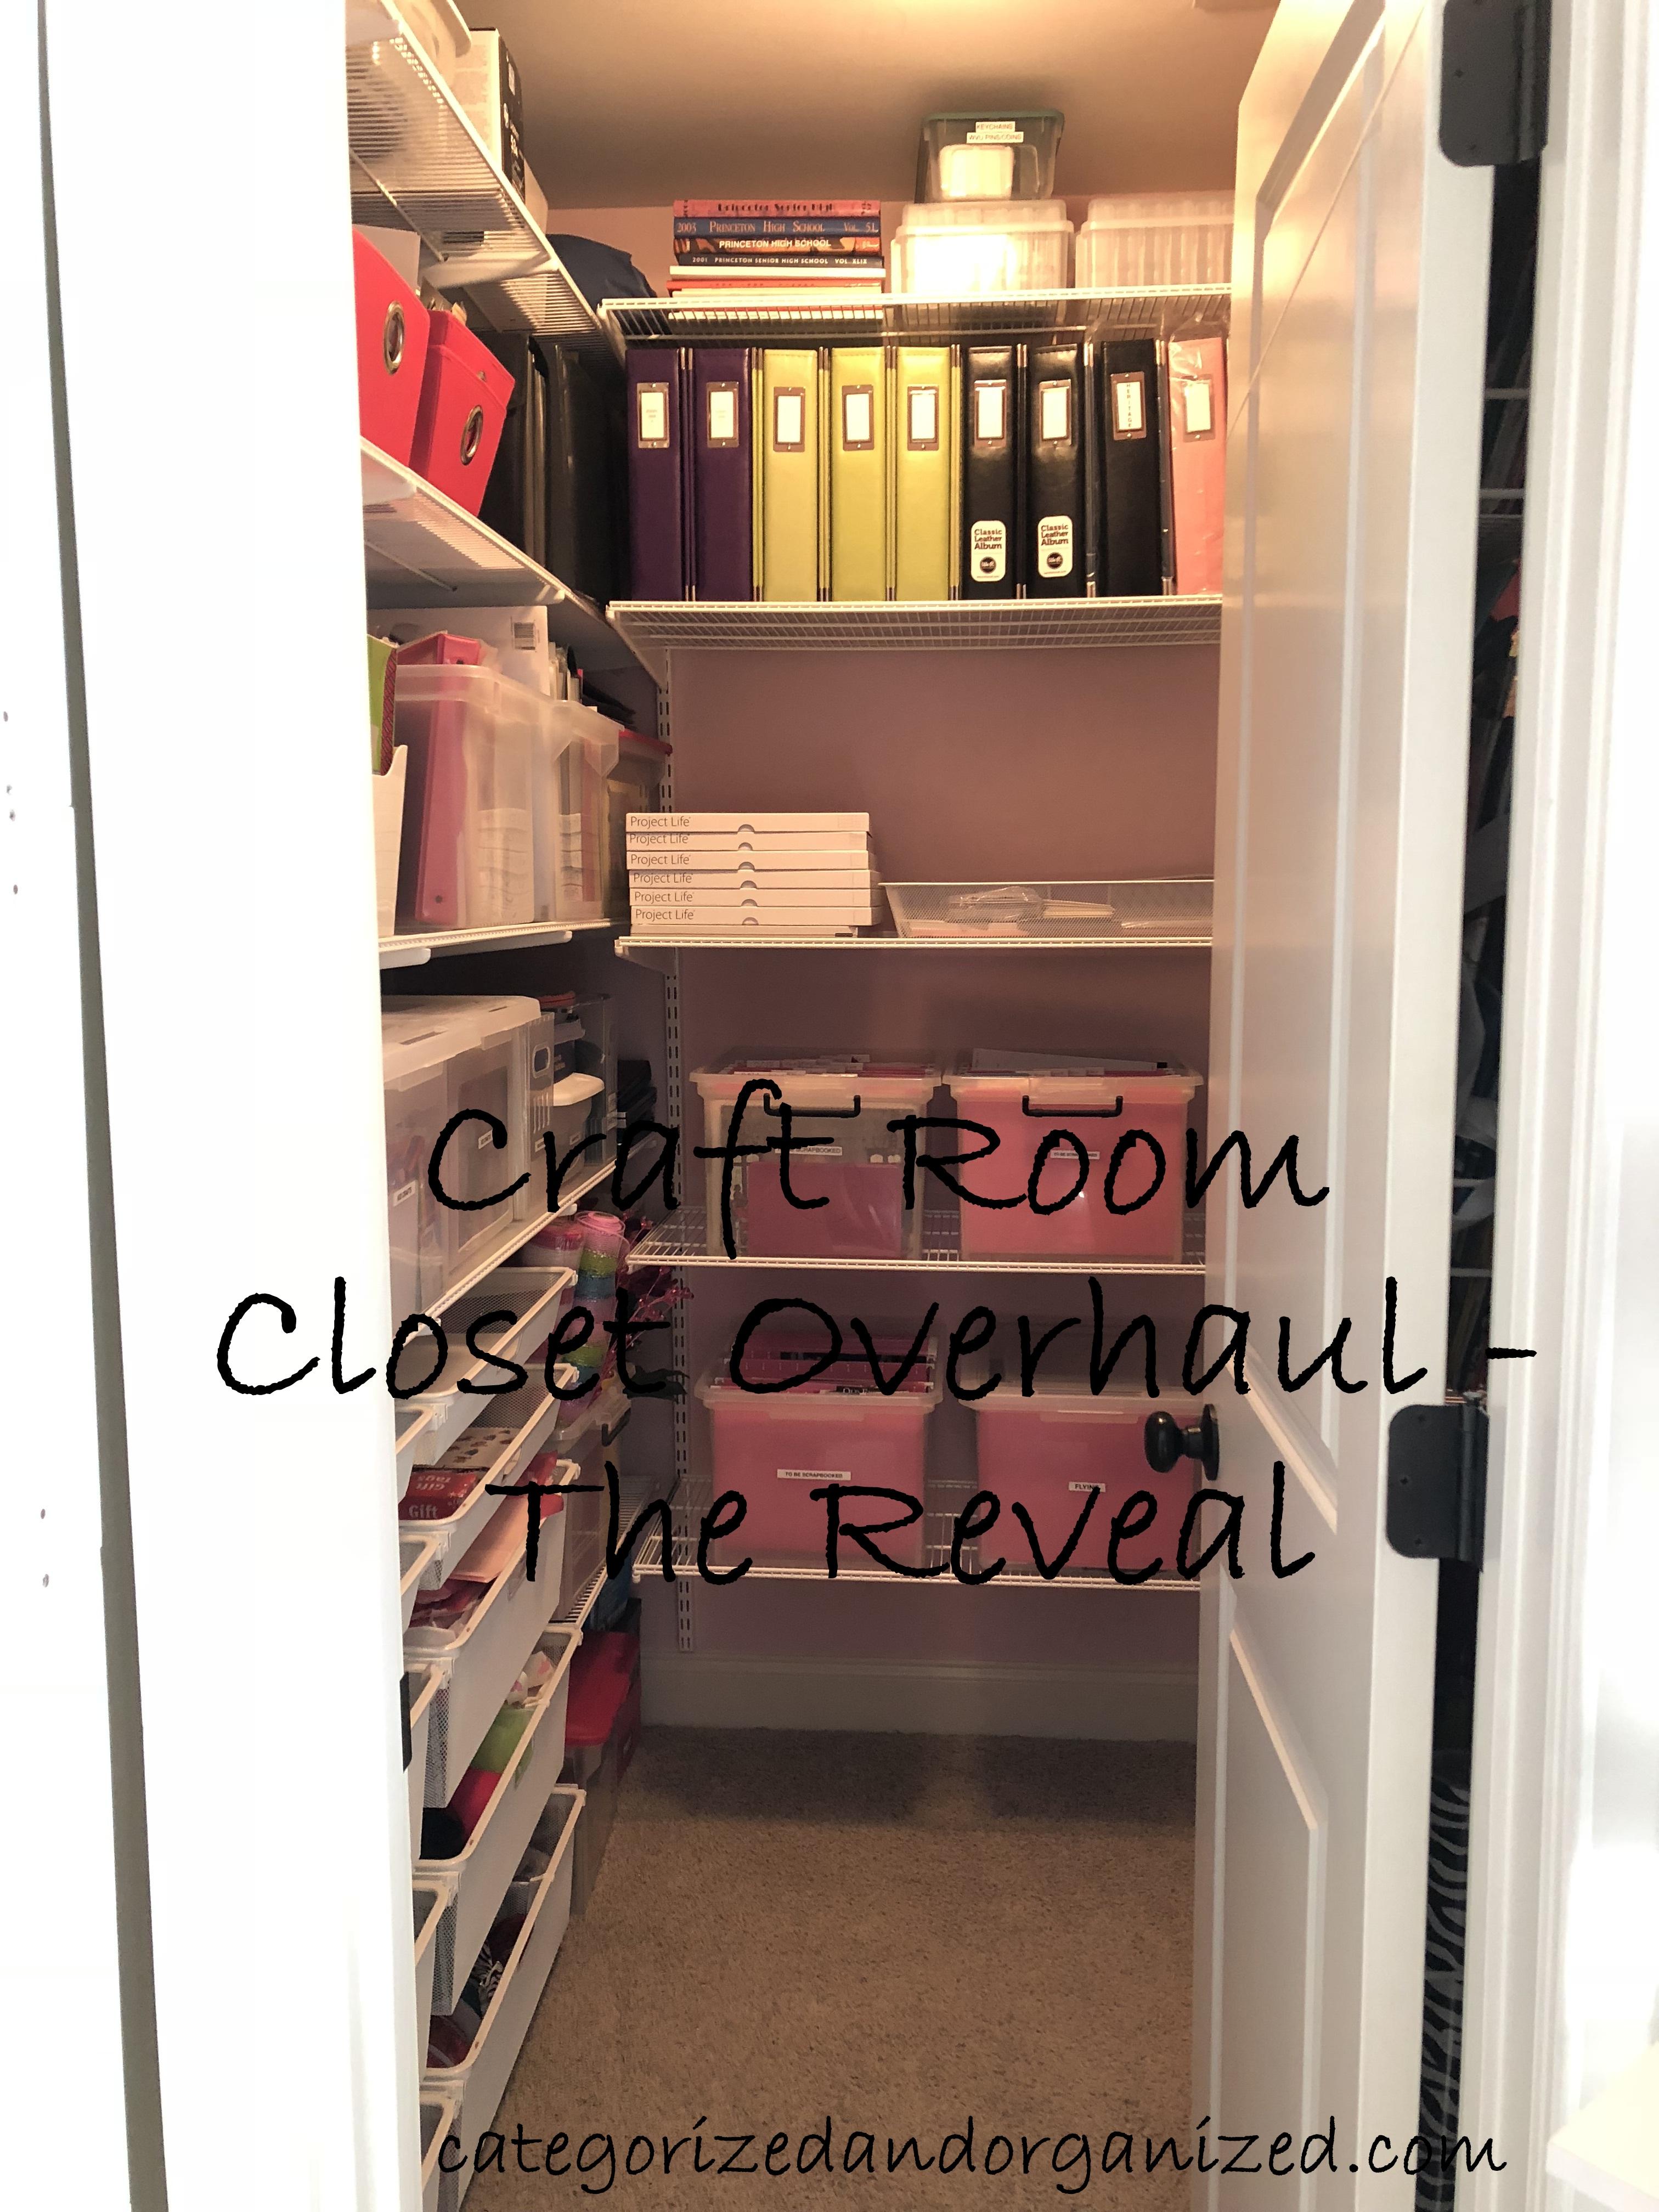 Craft Room Closet Overhaul The Big Reveal Categorized